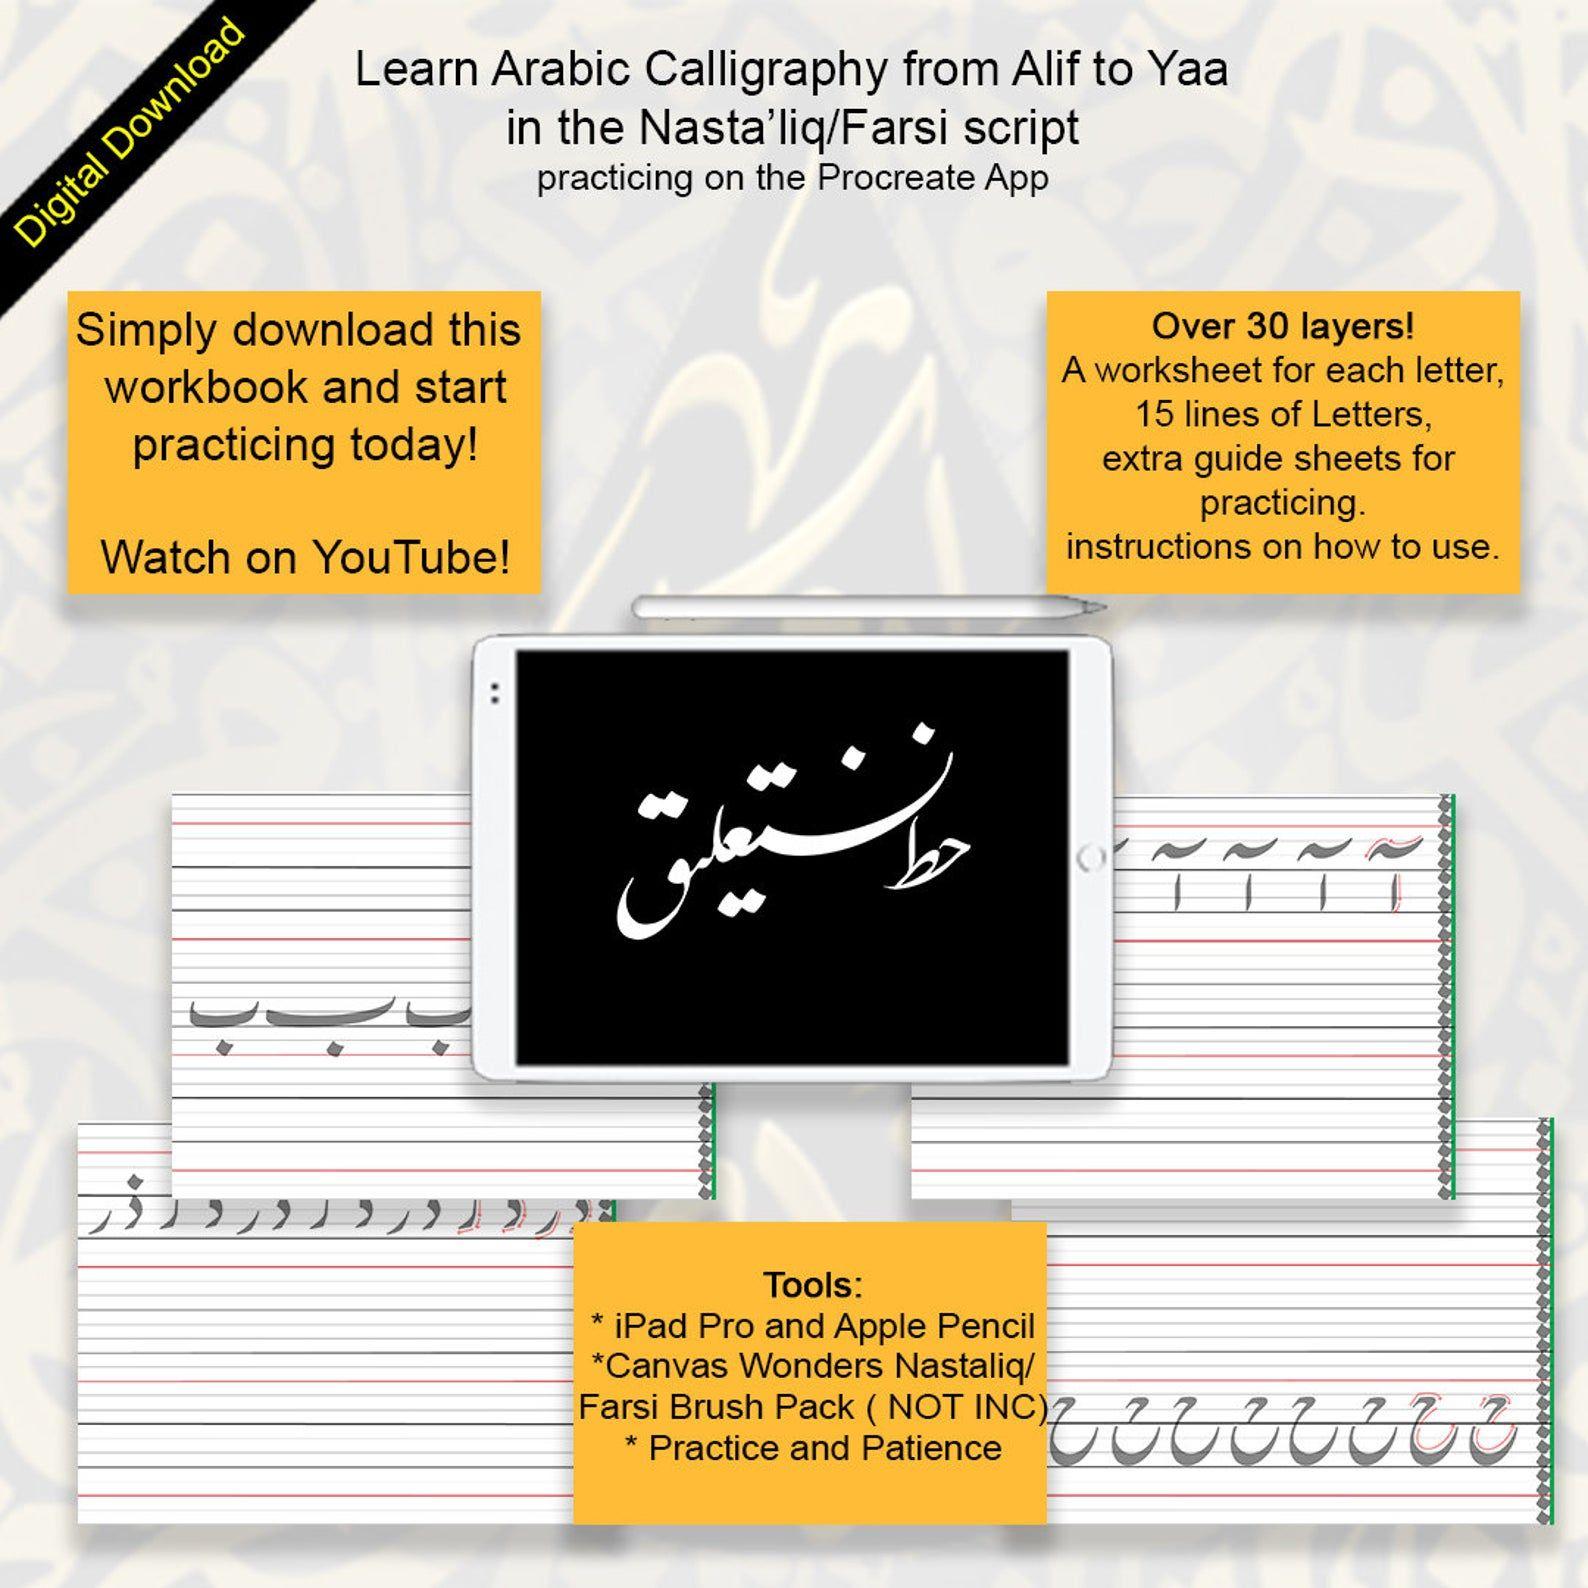 Arabic Calligraphy Procreate Nastaliq Farsi Worksheets In